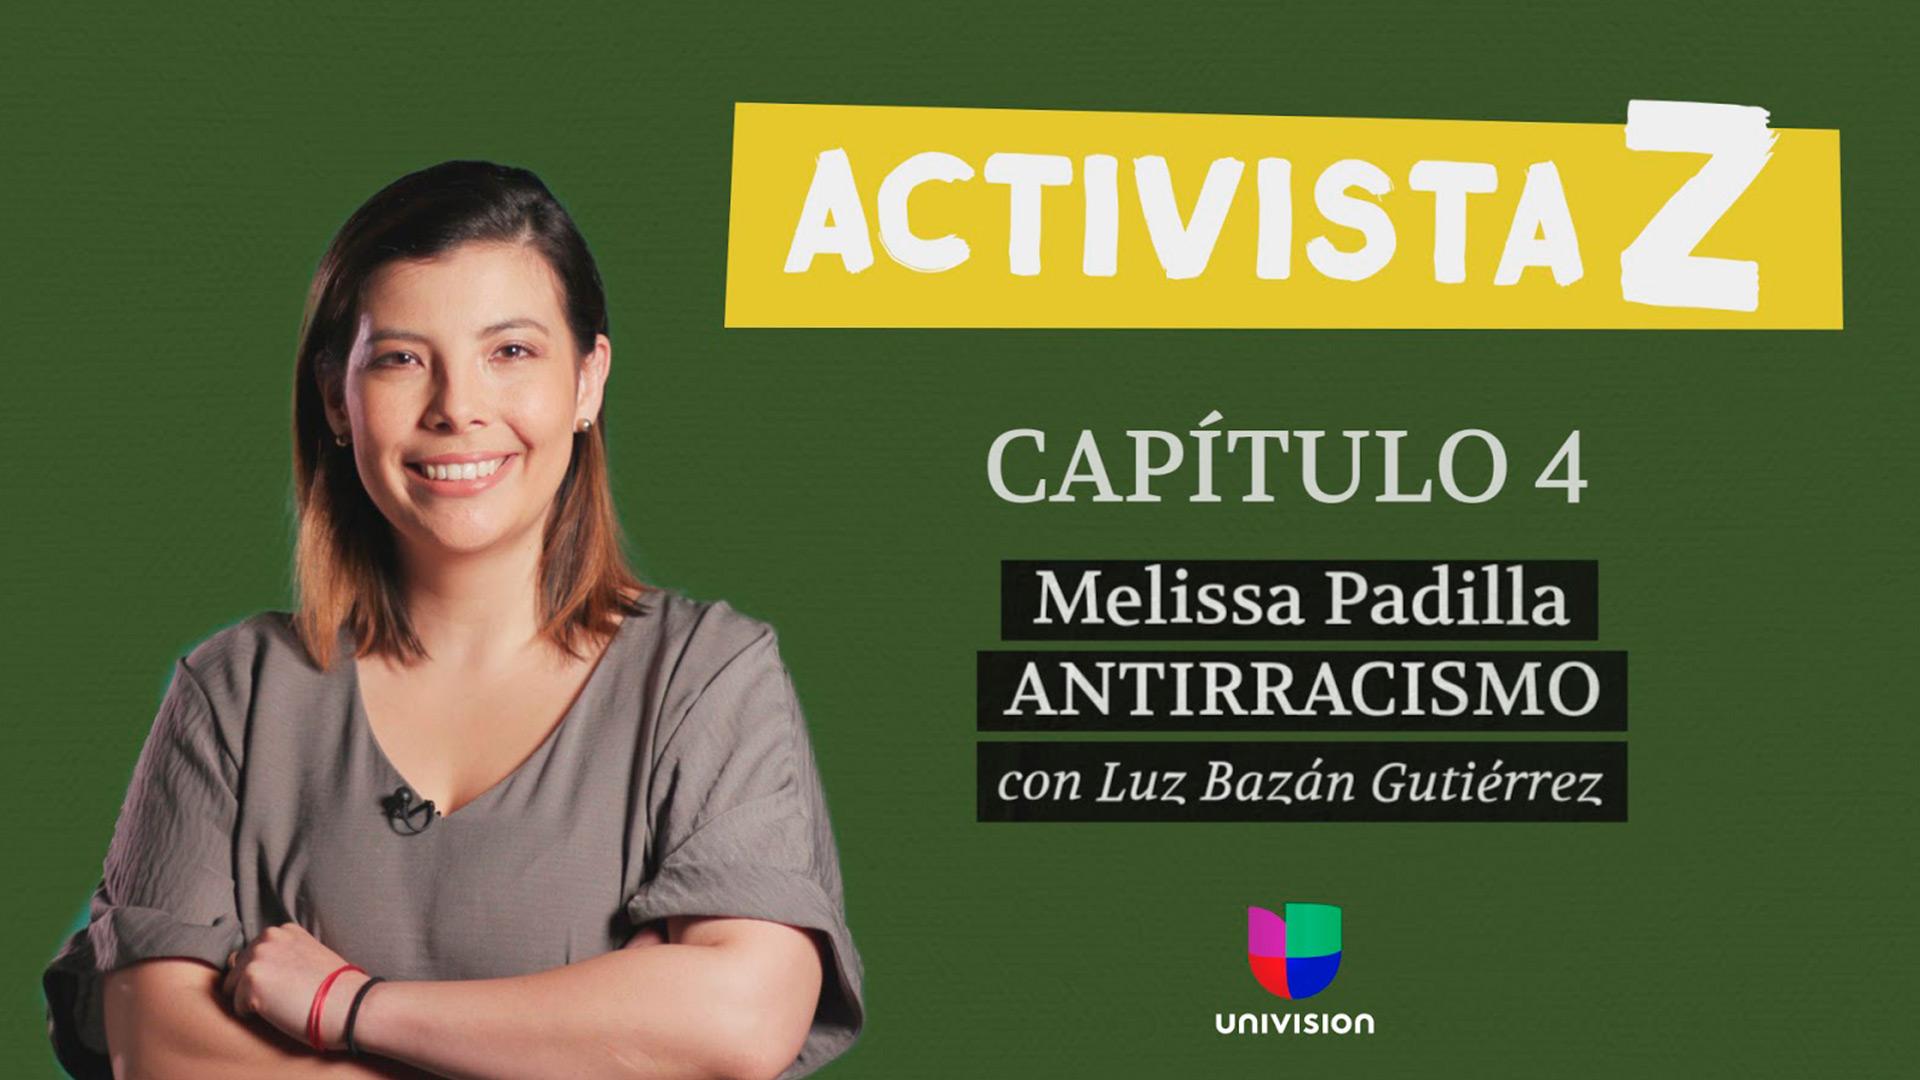 Univision ActivistaZ